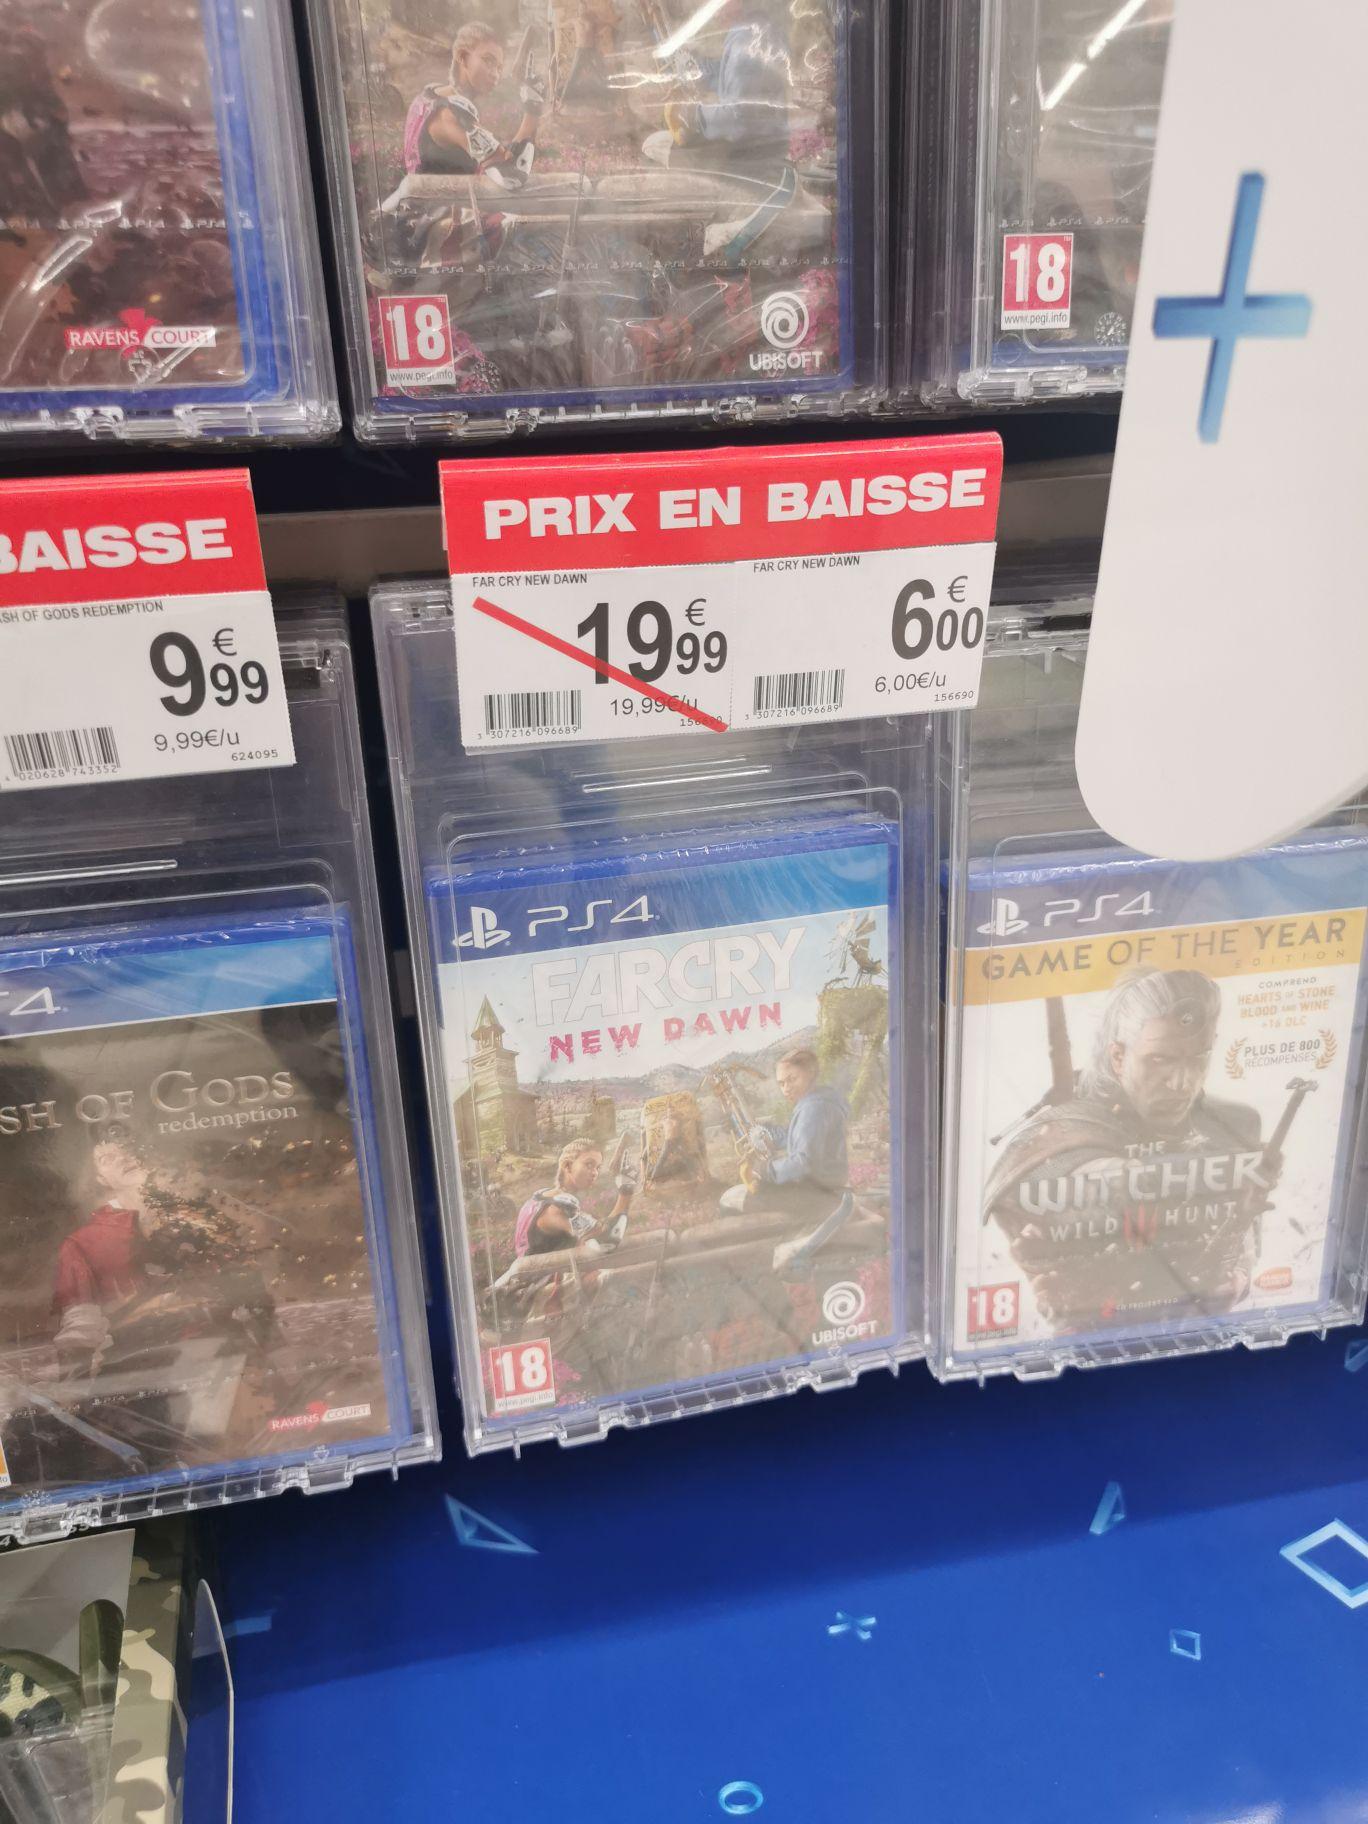 Farcry New Dawn sur PS4 - Auchan Avignon Nord (84)